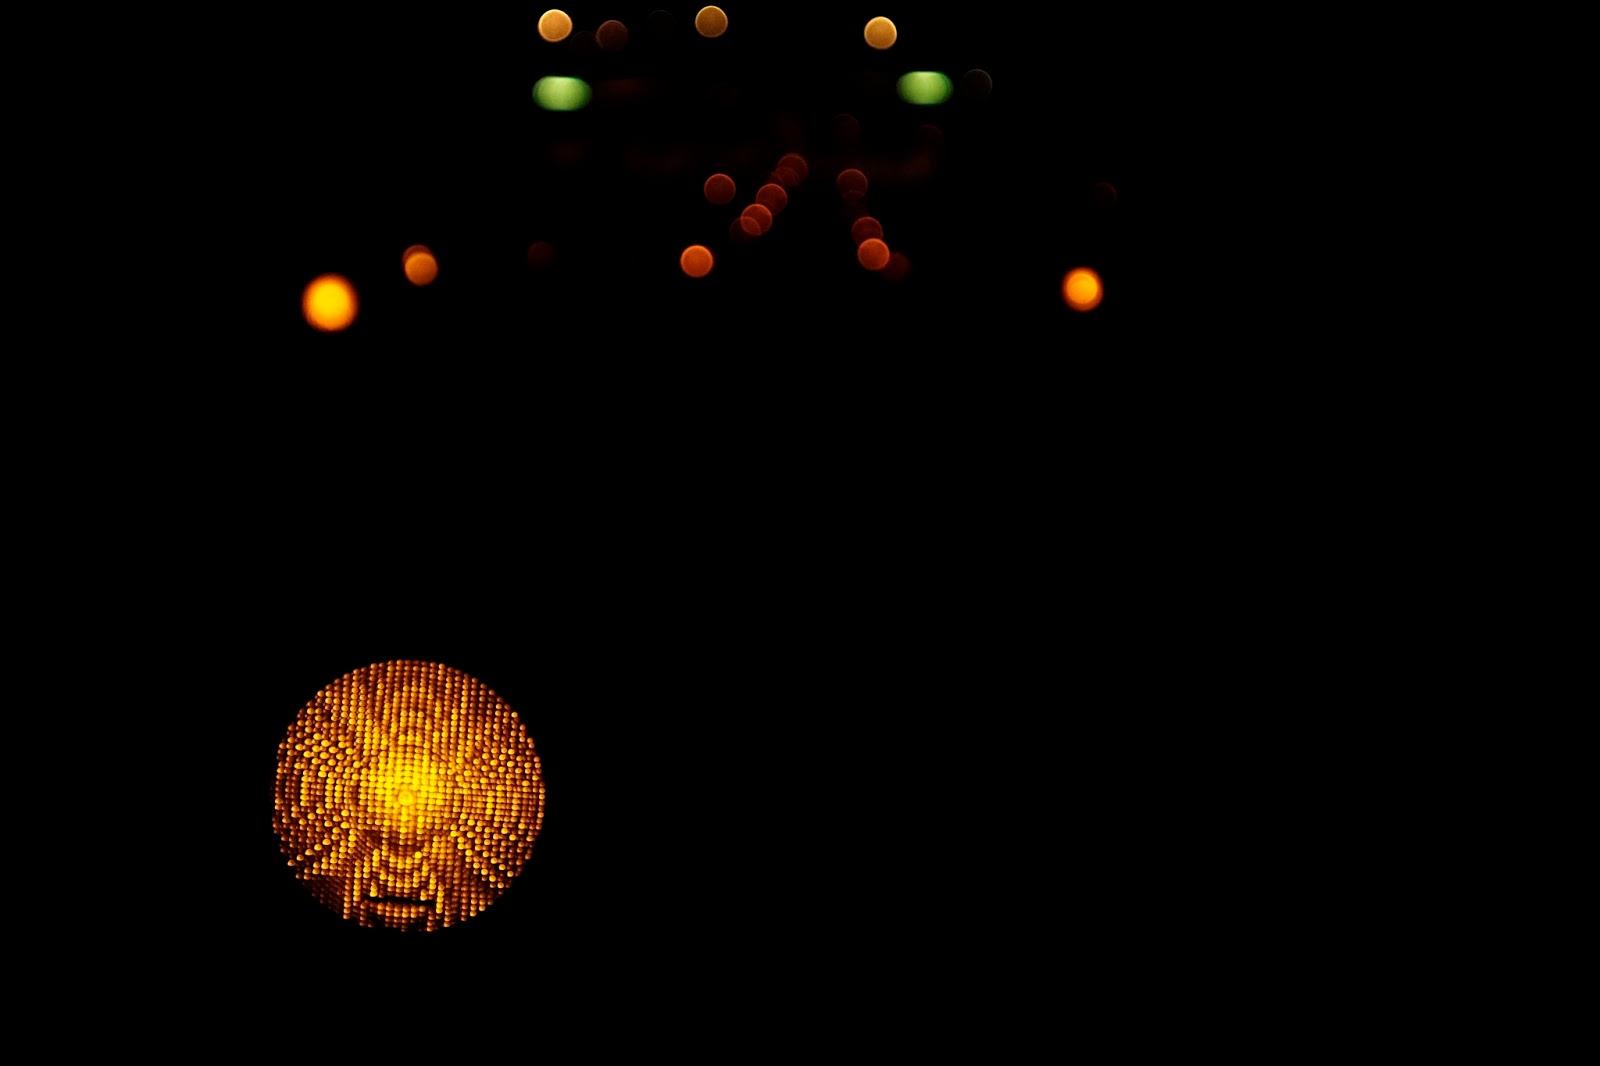 Photos a6000 night lights with avenger 50mm minolta - Avenger nightlights ...